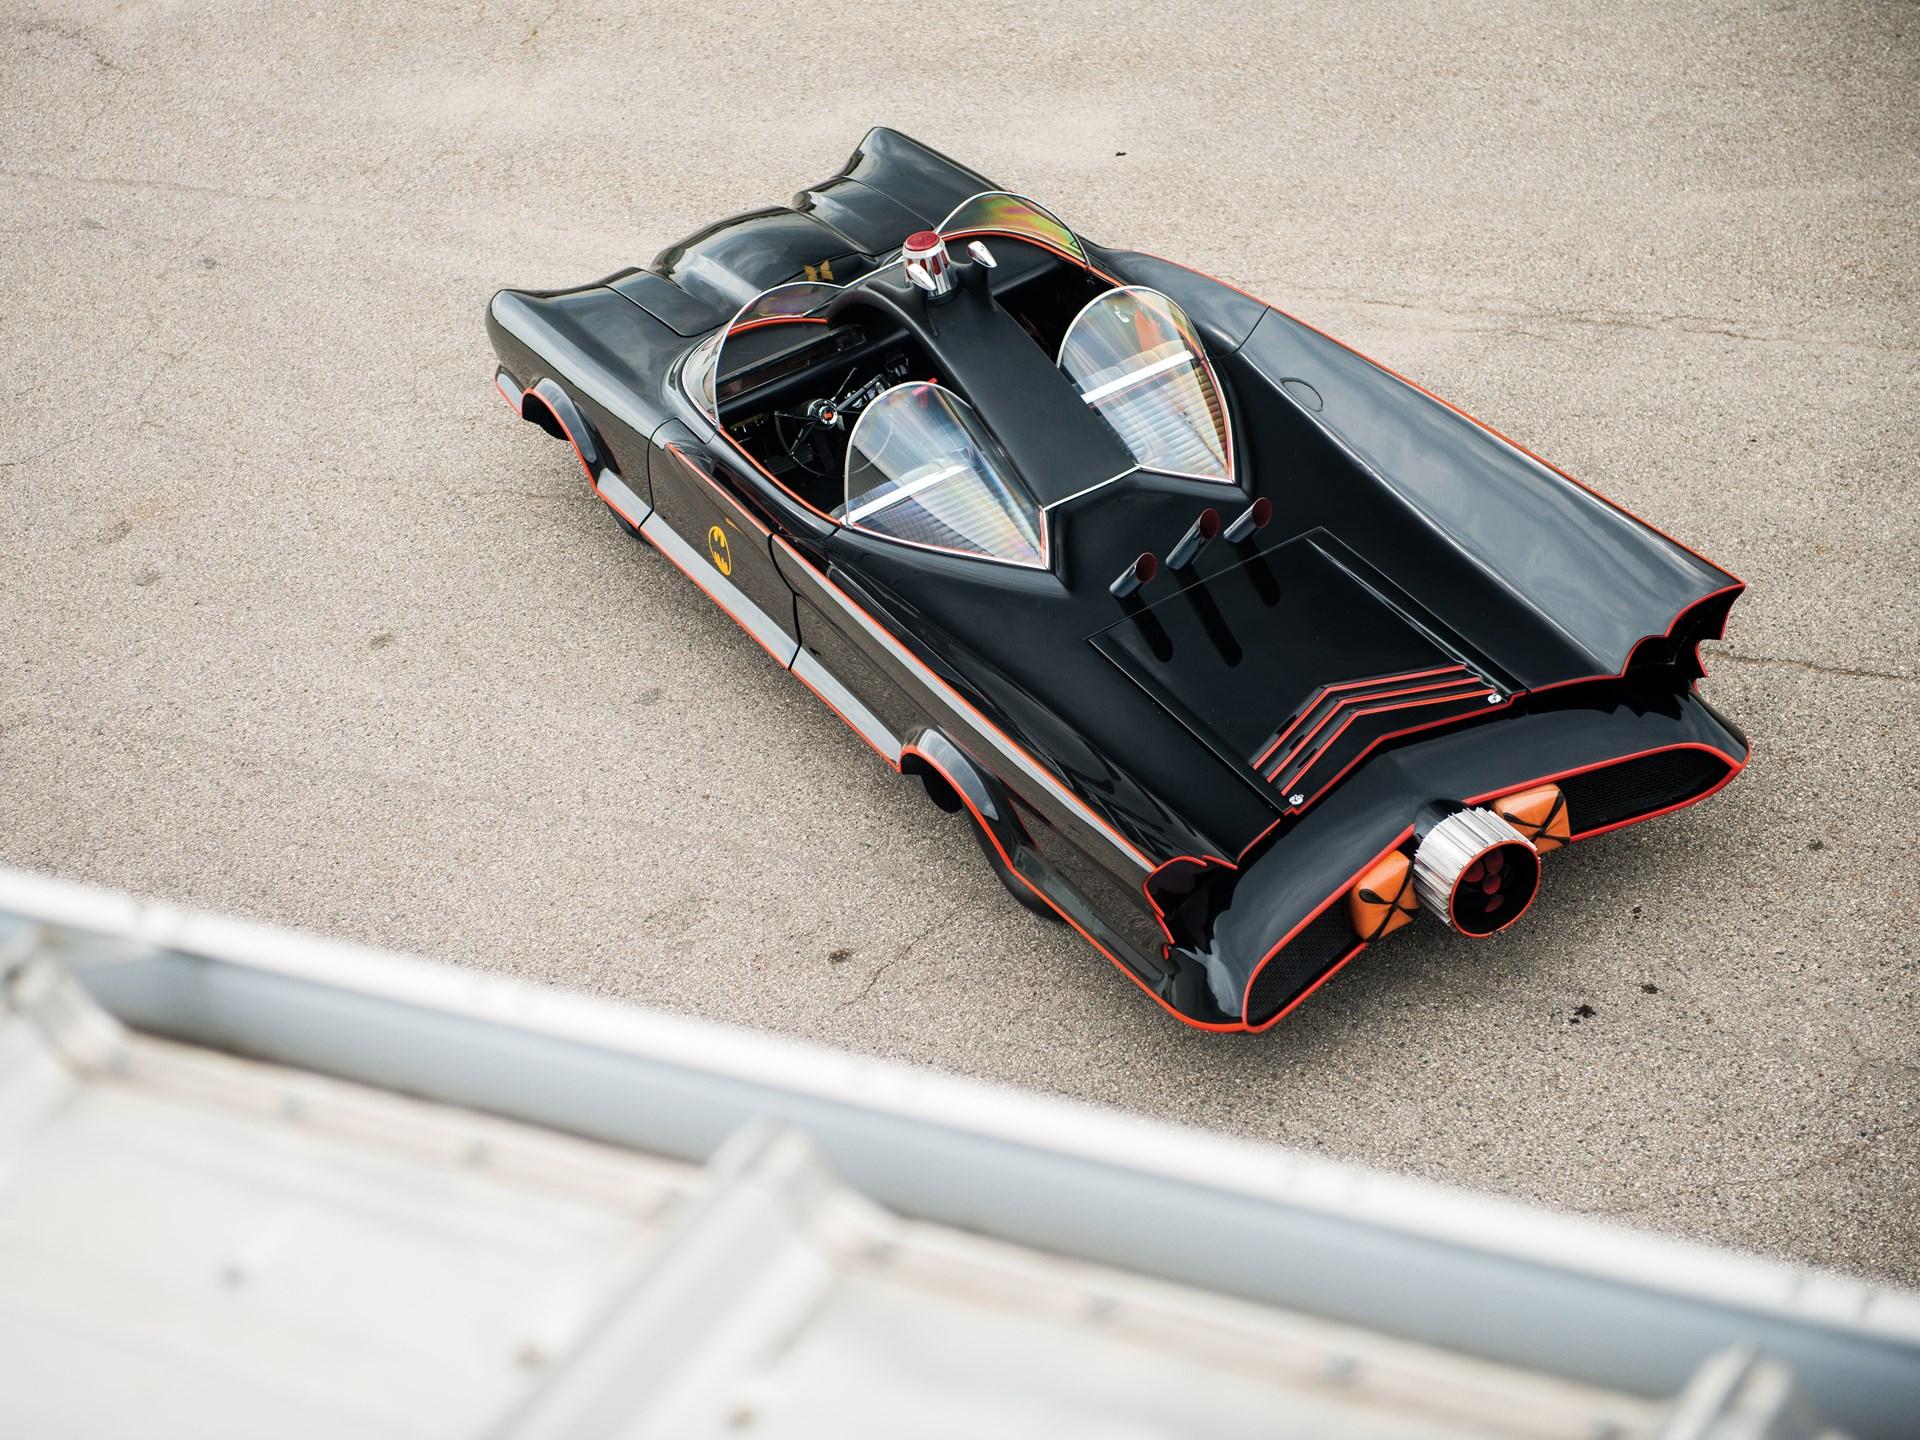 1966 Batmobile Recreation high 3/4 rear